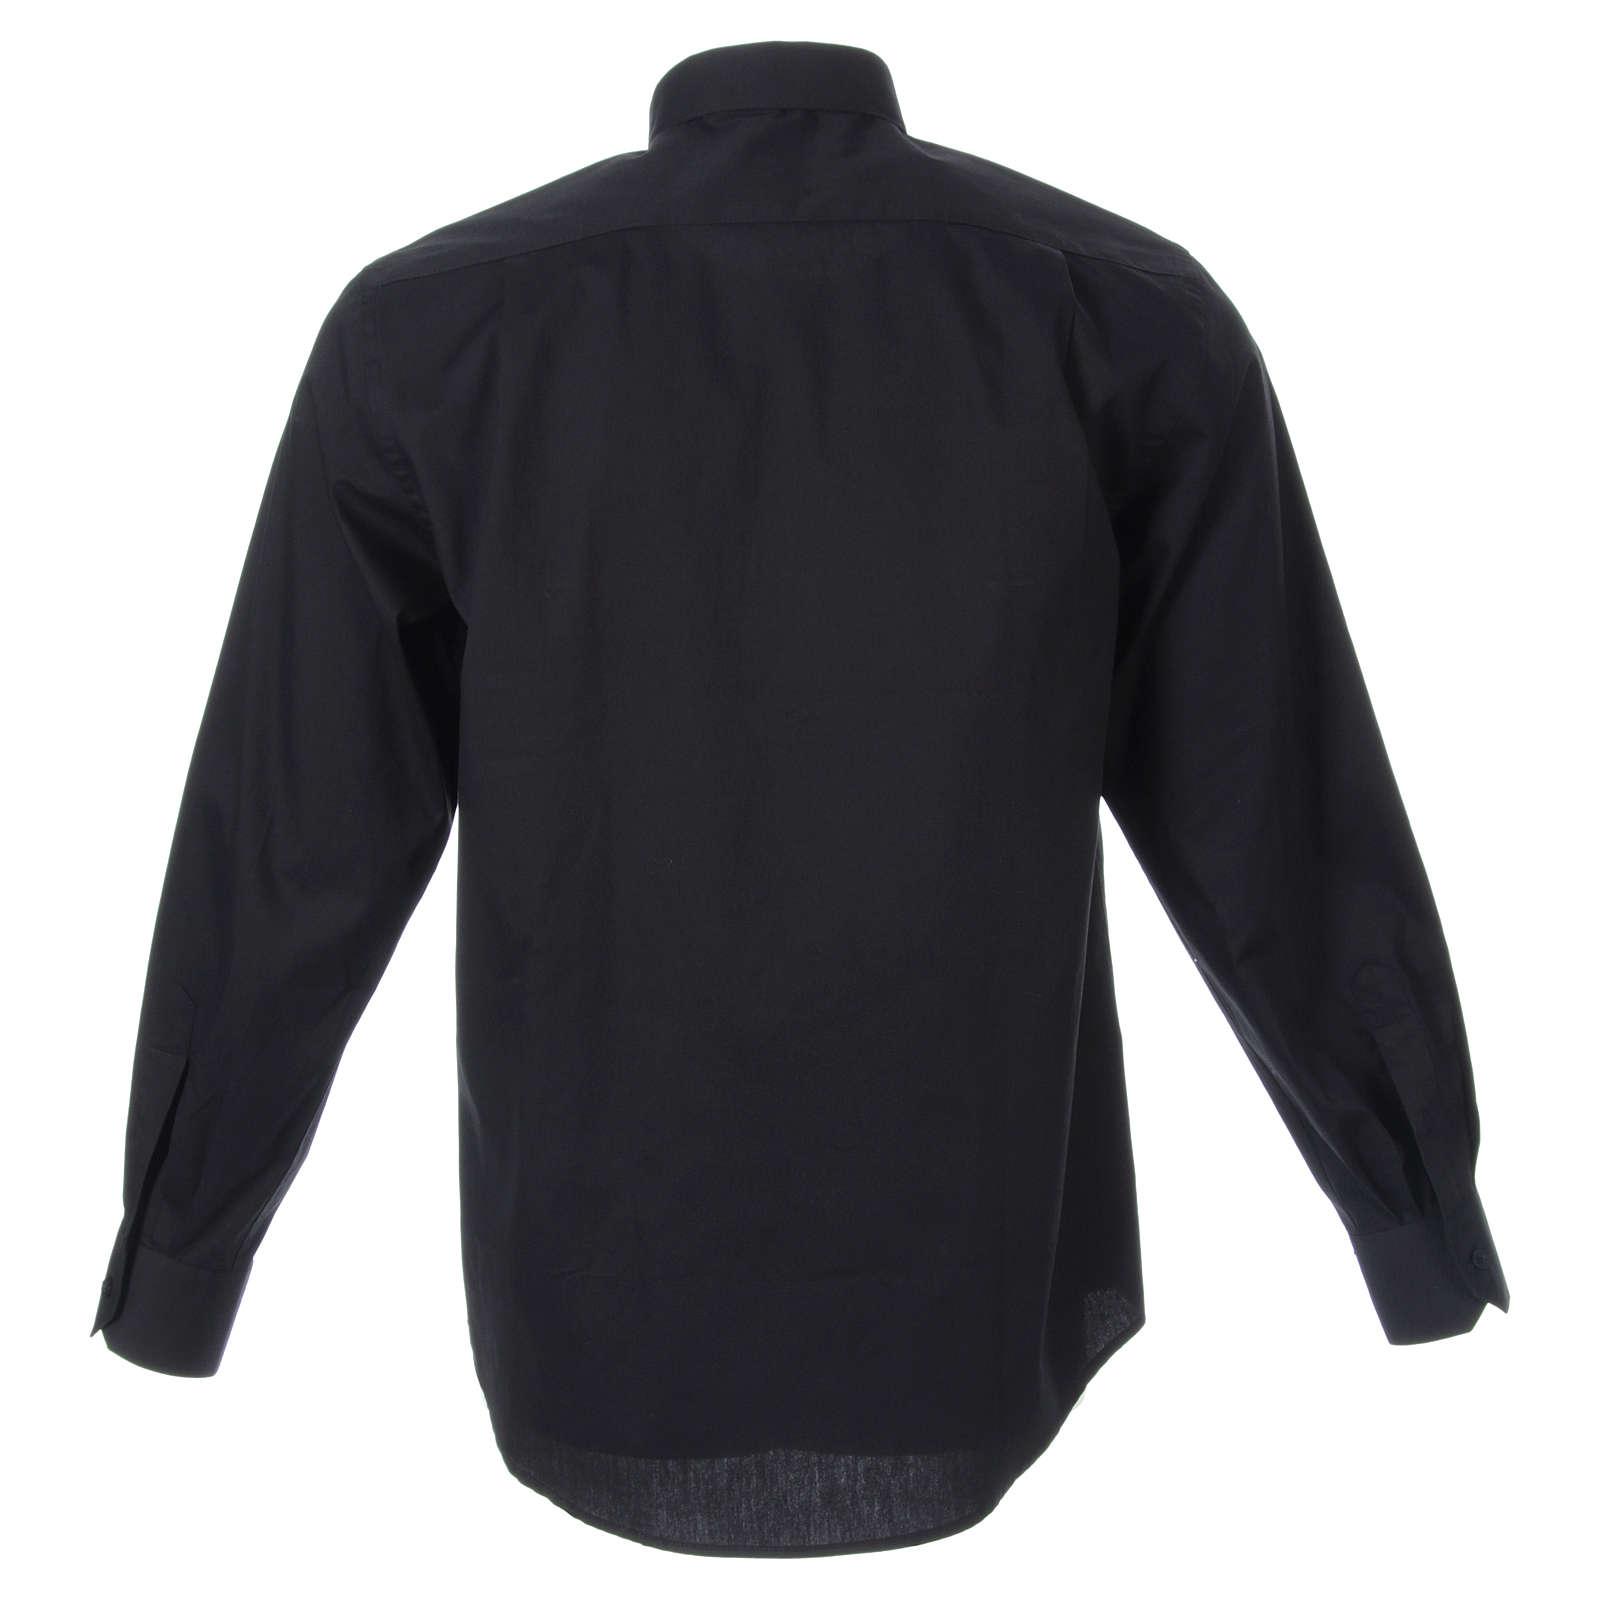 STOCK Camisa clergy de popelina manga larga negra 4